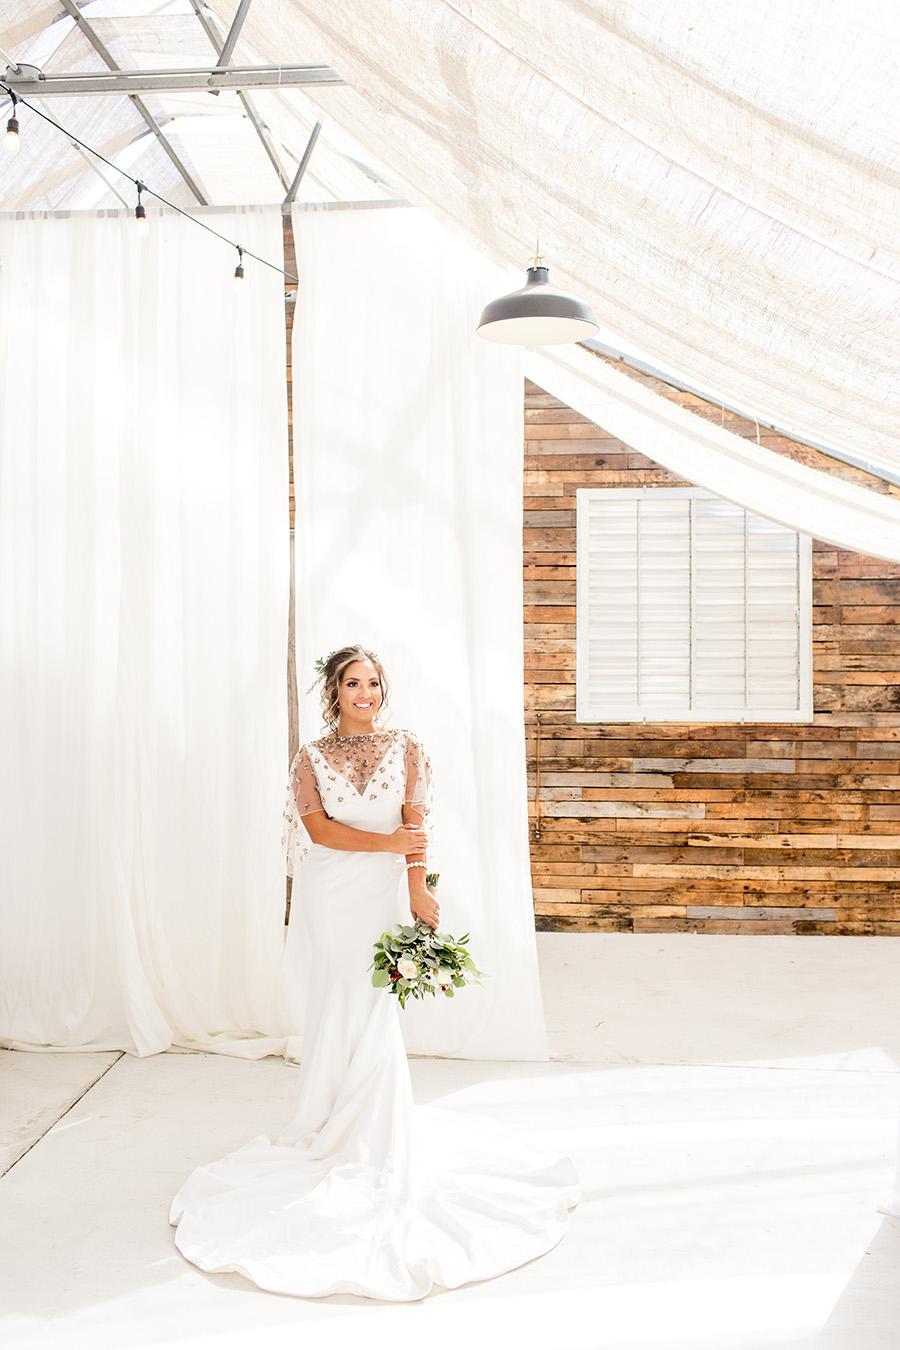 Modern wedding dress with embellished capelet